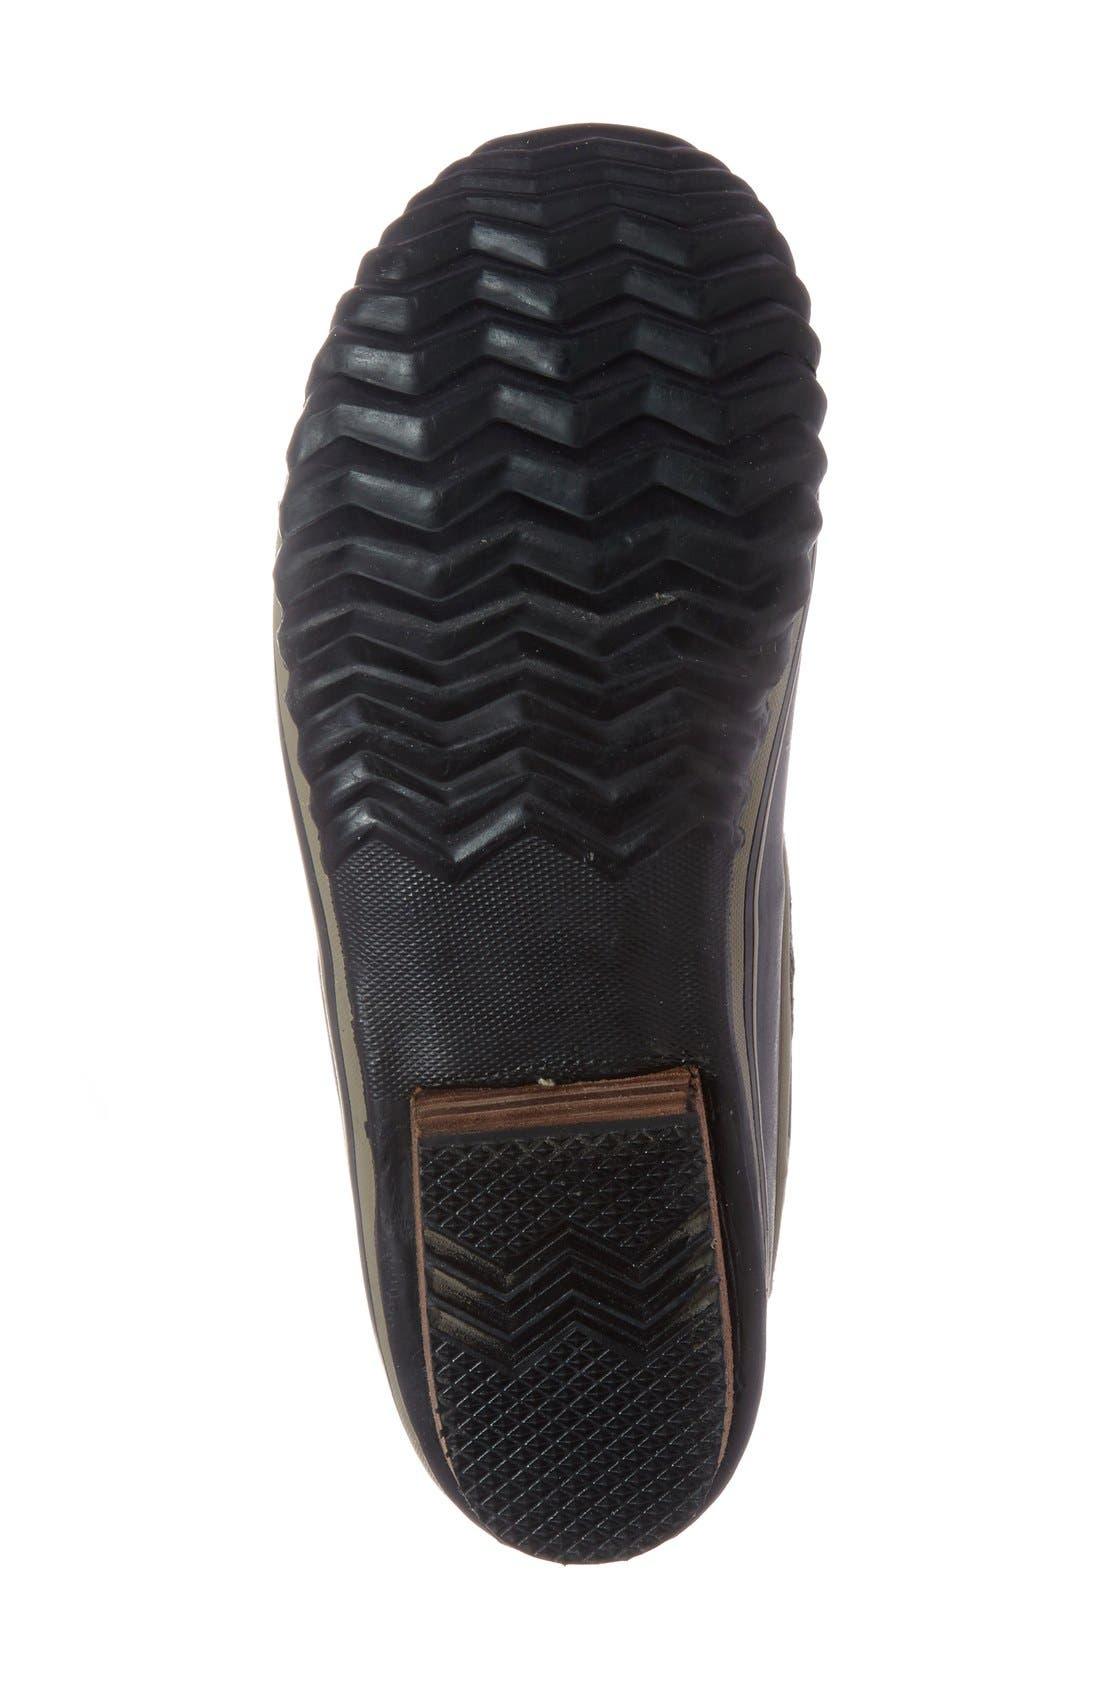 Alternate Image 4  - SOREL 'Slimpack II' Waterproof Riding Boot (Women)